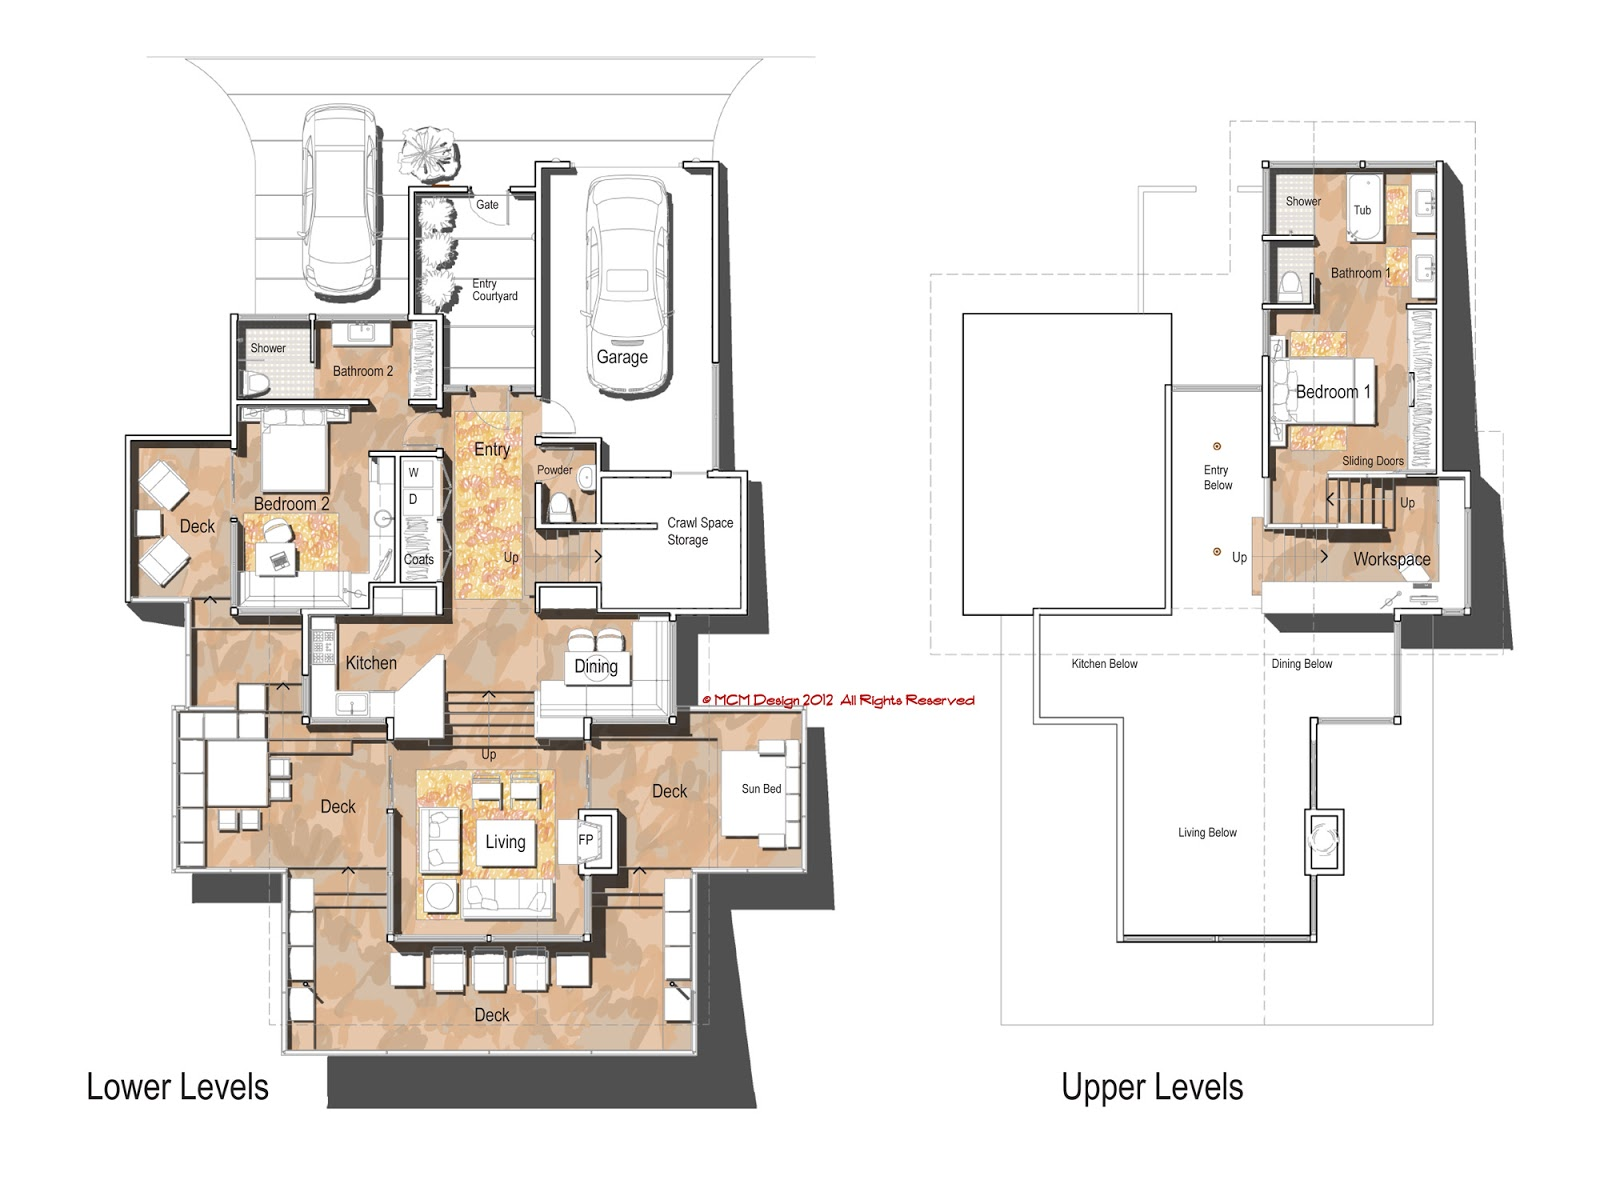 Remarkable Modern Mansion House Plans Home Design Decor Largest Home Design Picture Inspirations Pitcheantrous